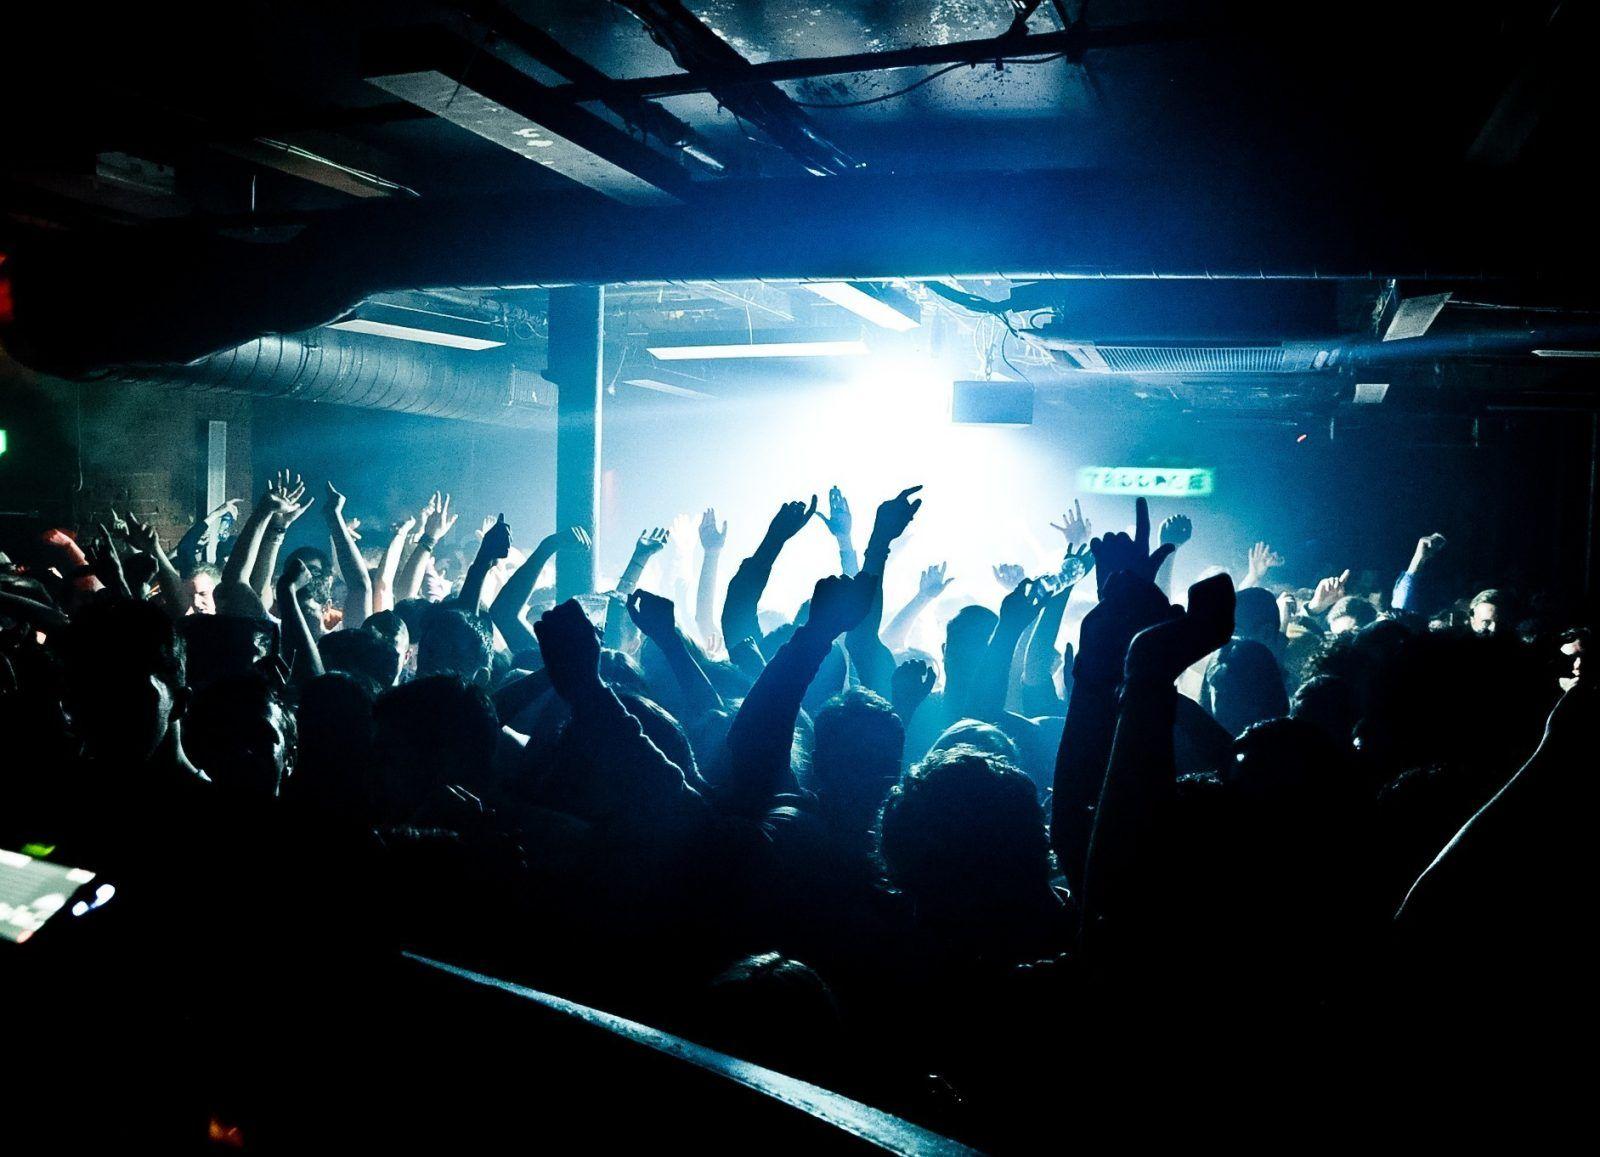 sankeys-crowd-2.jpg